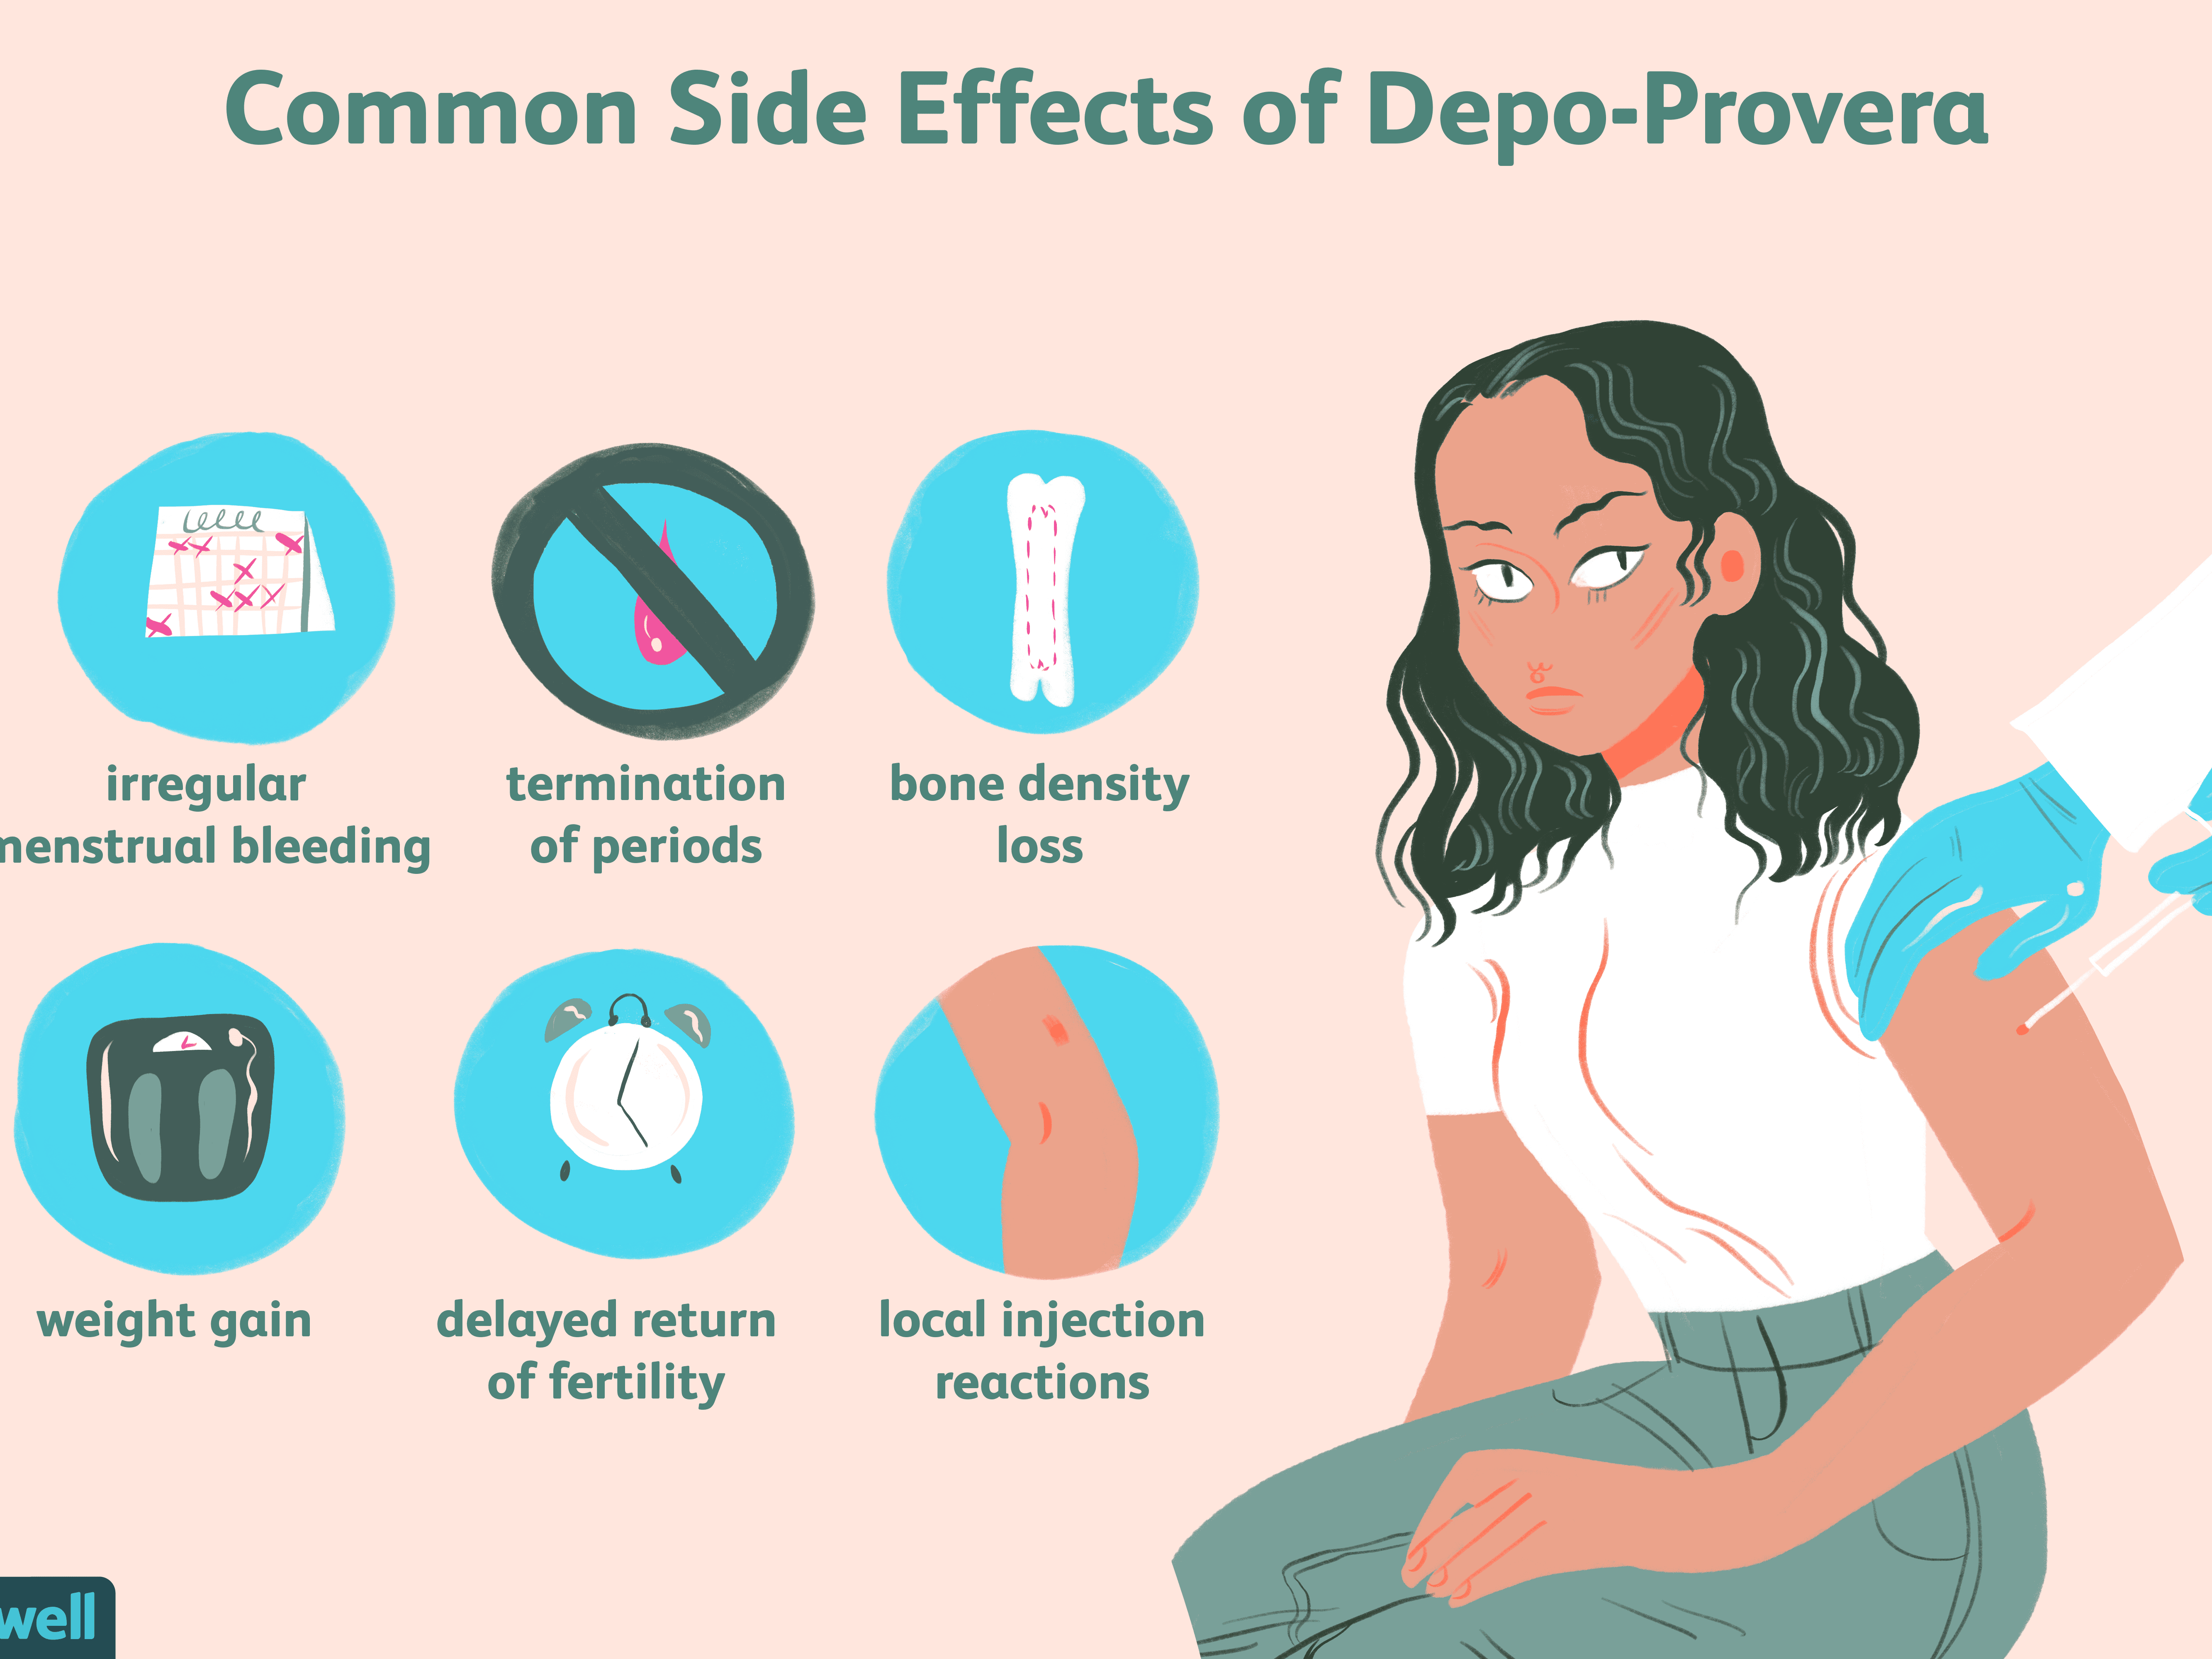 6 Common Depo-Provera Side Effects